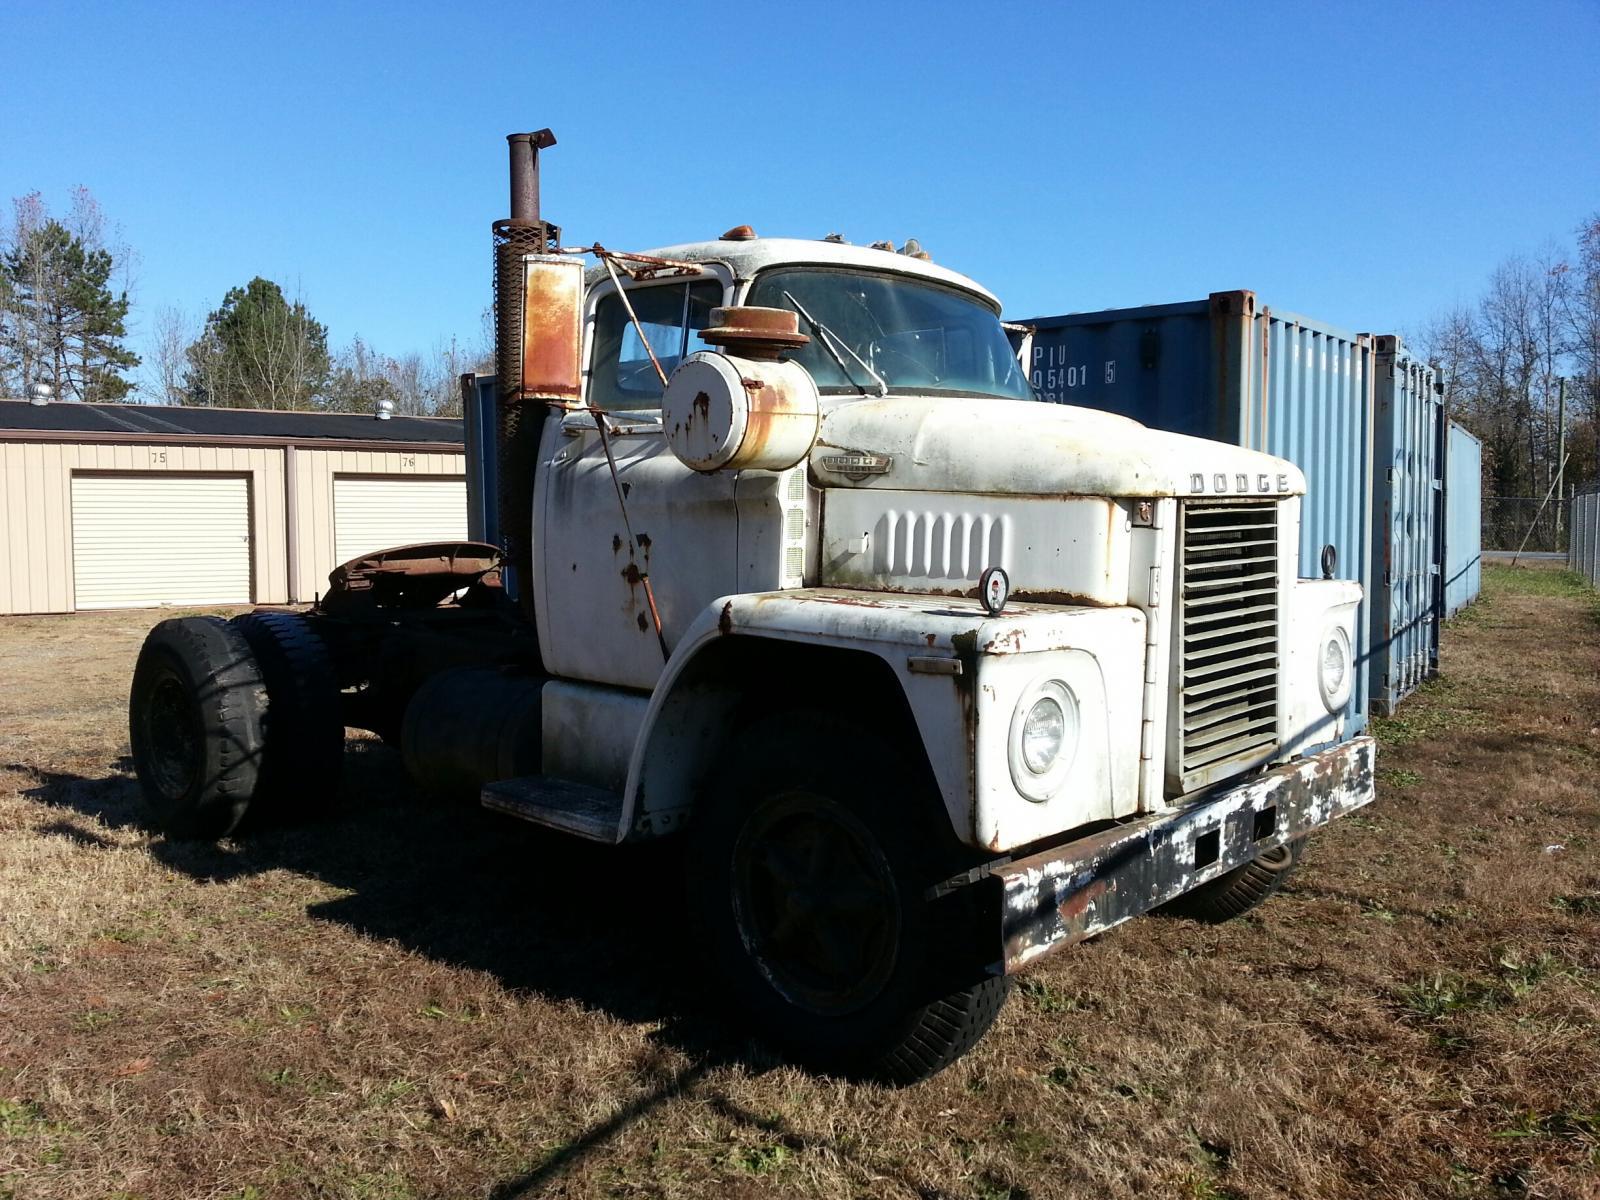 1971 Dodge Cn800 Tractor Trucks For Sale Bigmacktrucks Com